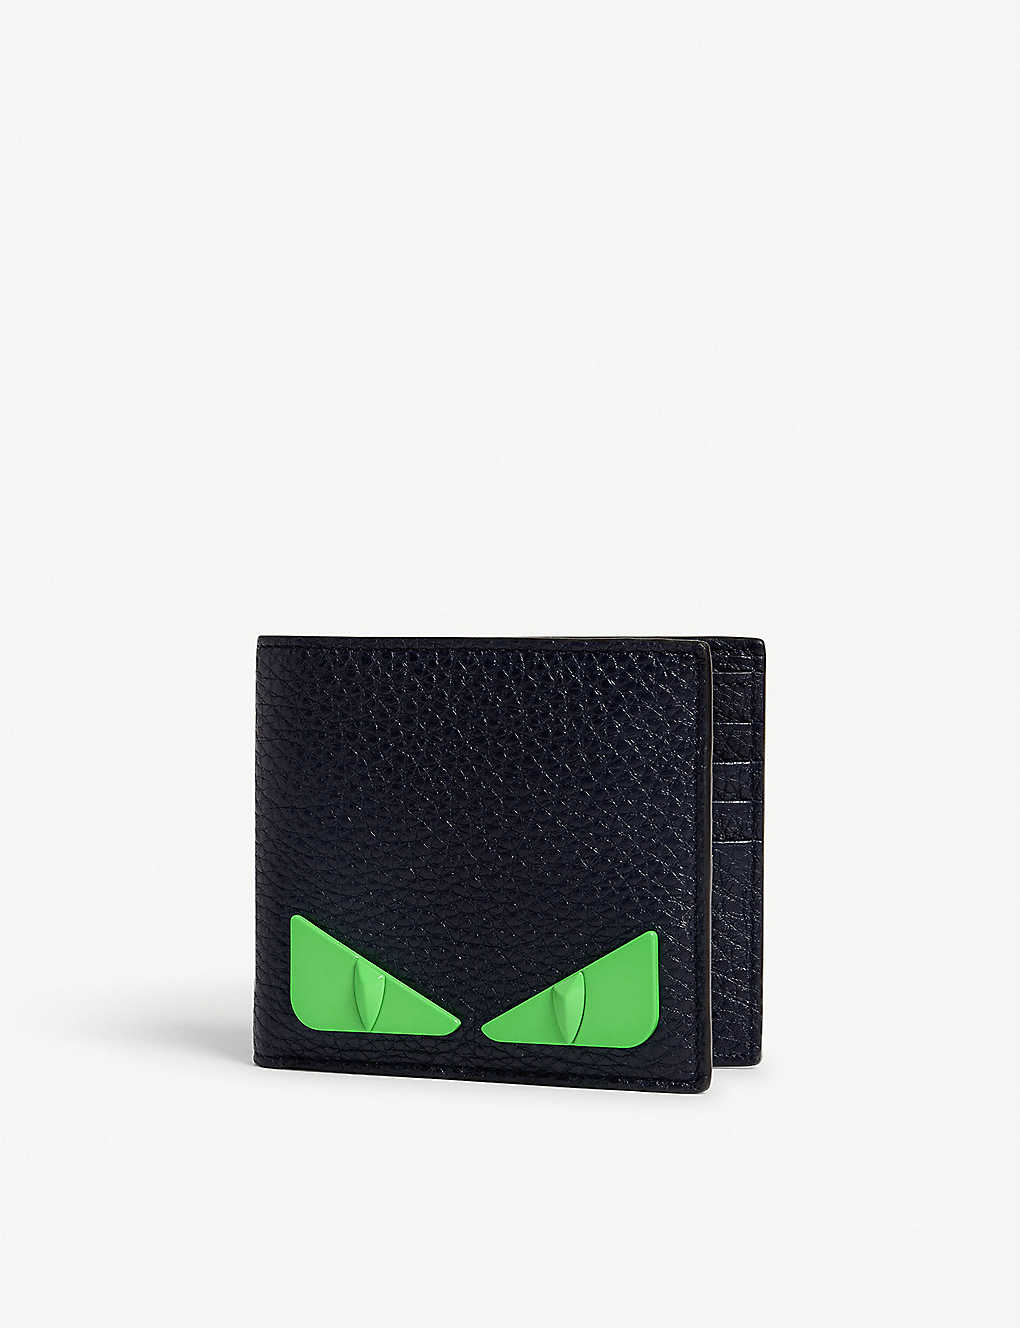 8247ac2d46c FENDI - Bag Bugs leather billfold wallet | Selfridges.com